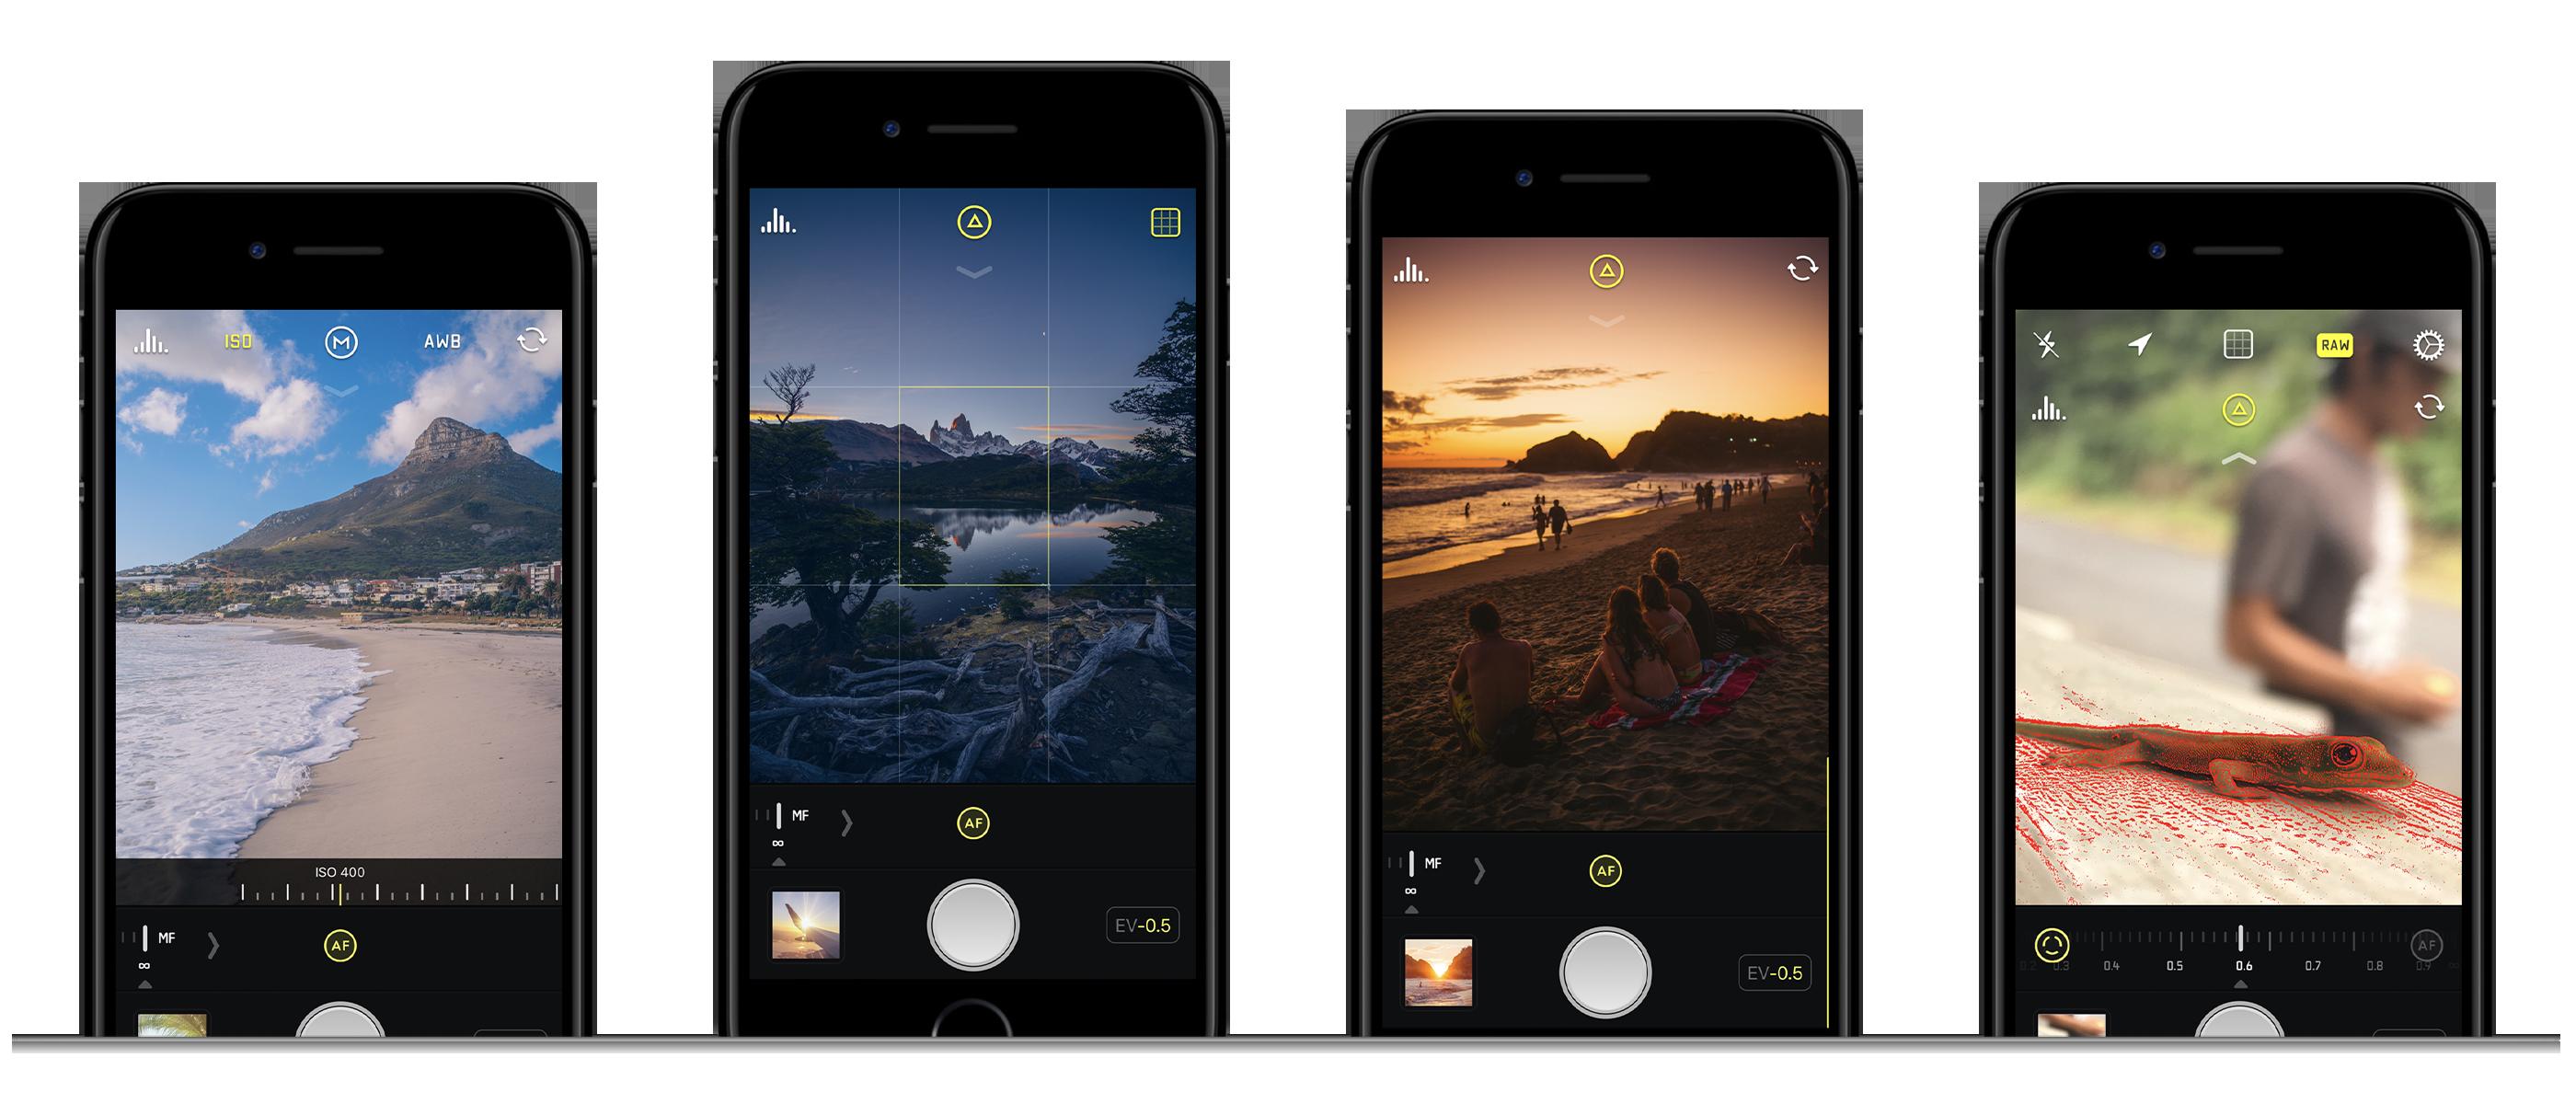 App de câmera para iPhone Halide